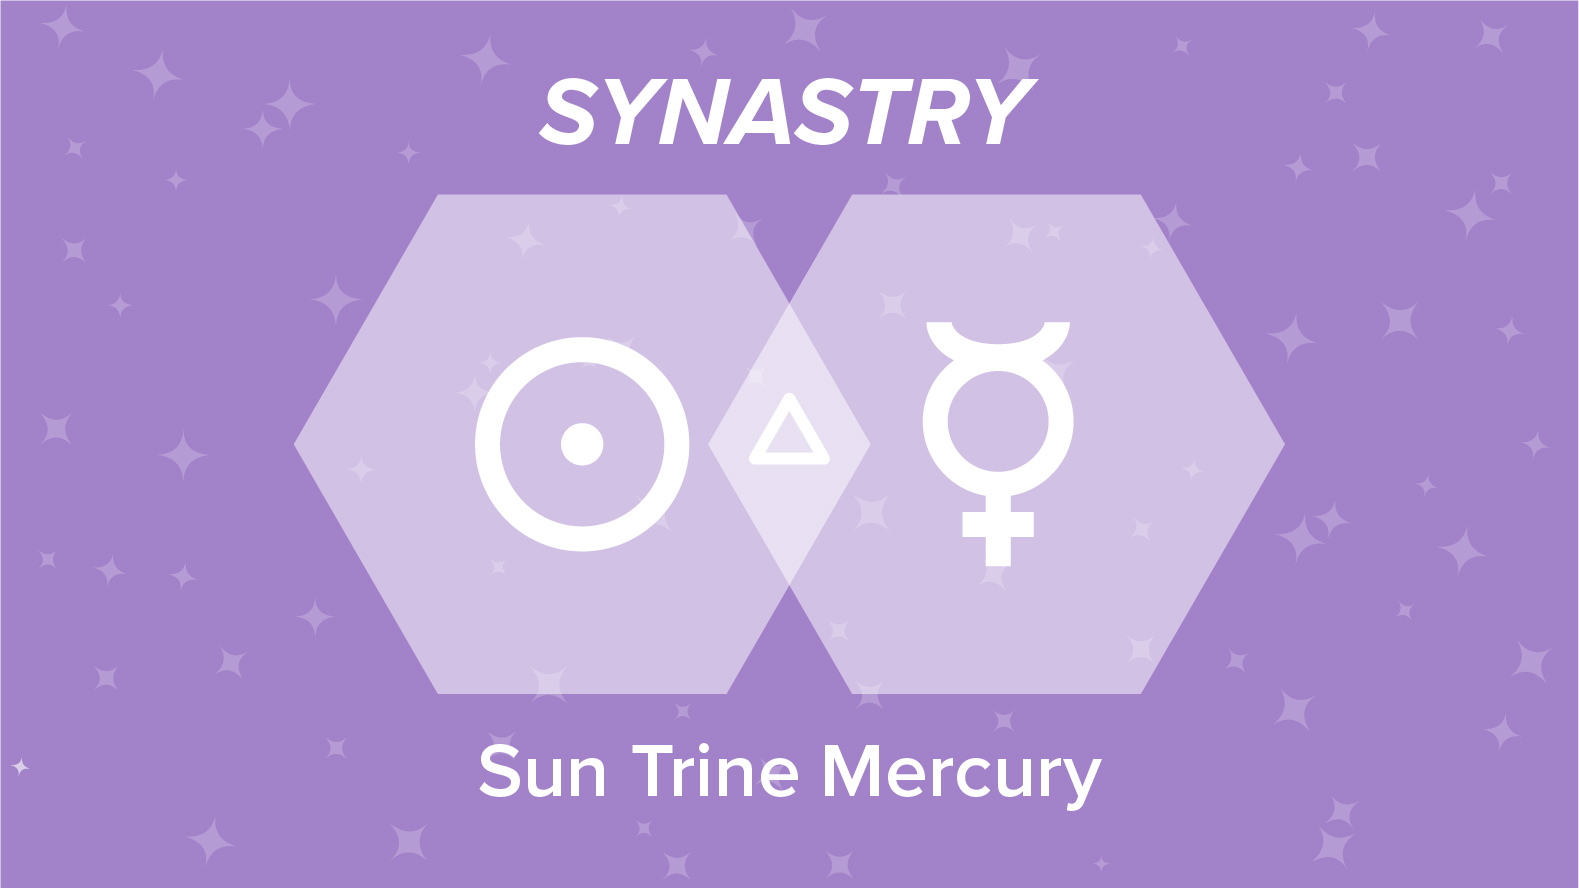 Sun Trine Mercury Synastry